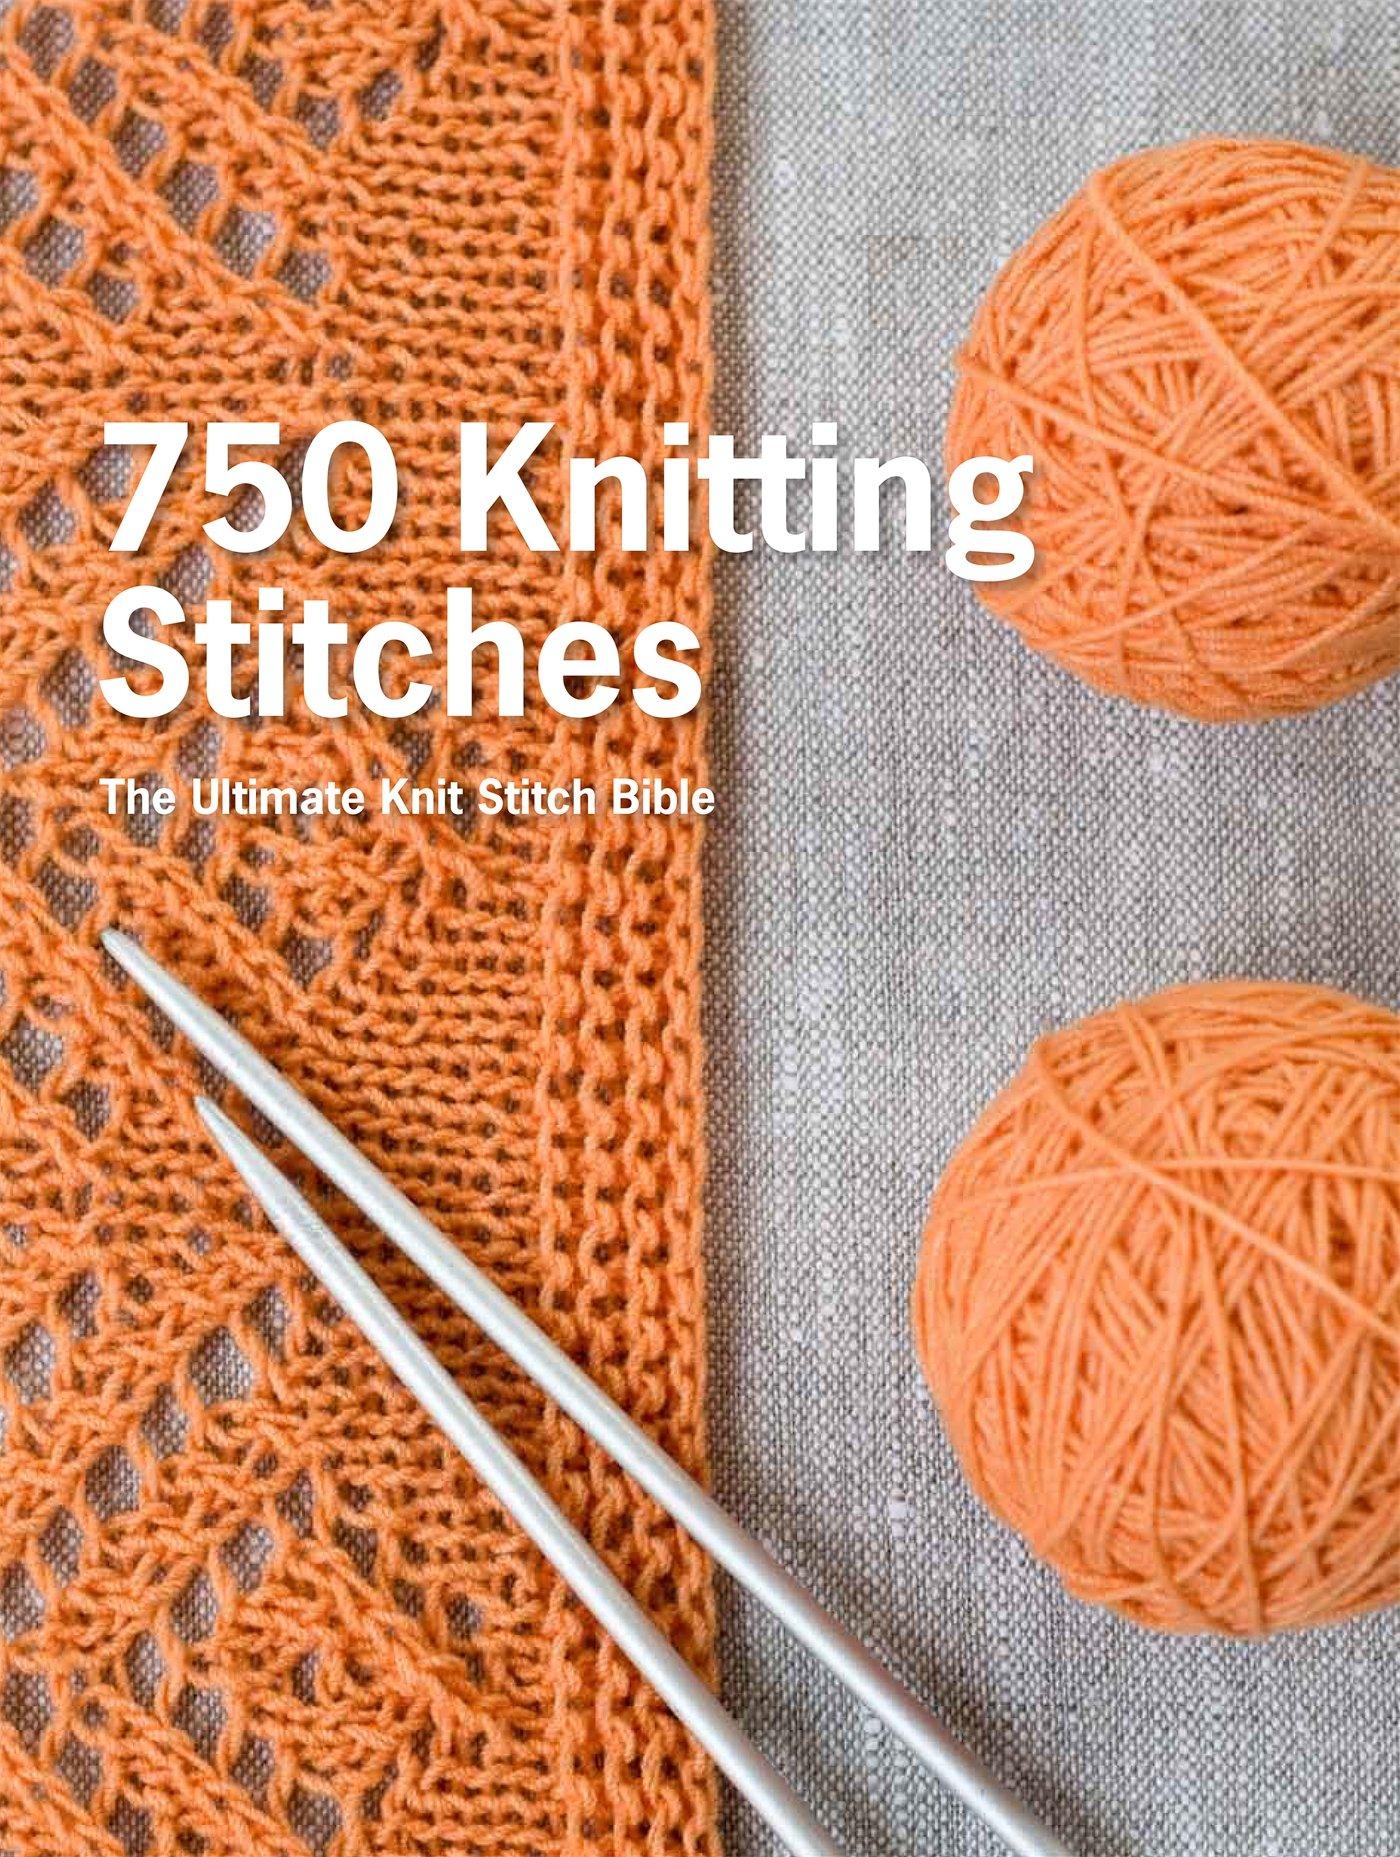 Ultimate Knitting Quiz : Knitting stitches the ultimate knit stitch bible i